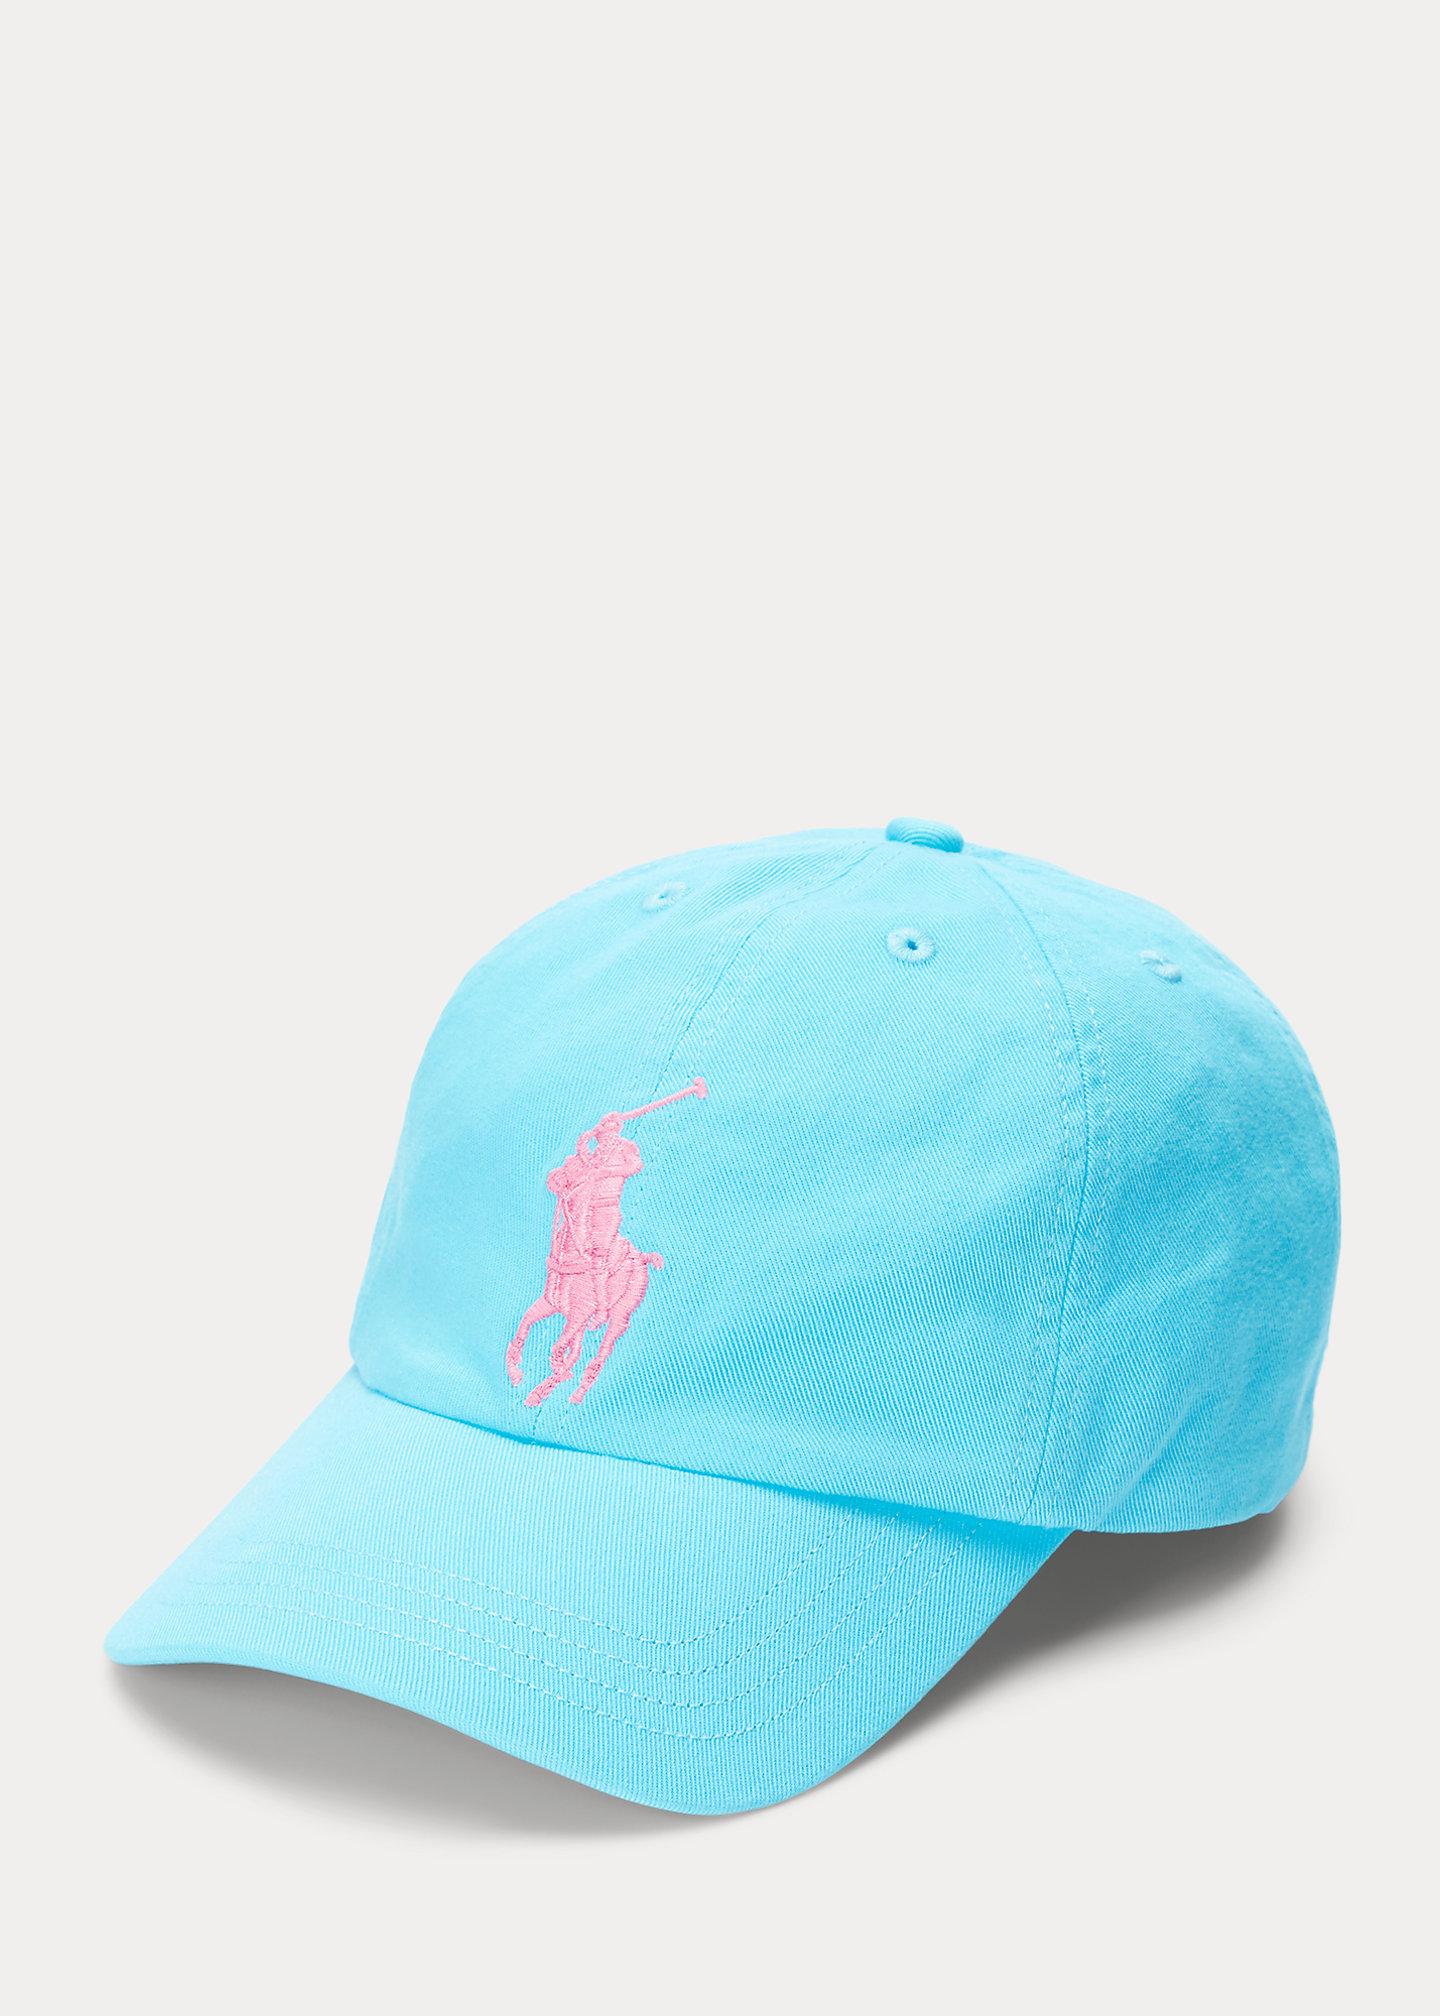 Polo Ralph Lauren Big Pony Cotton Chino Ball Cap